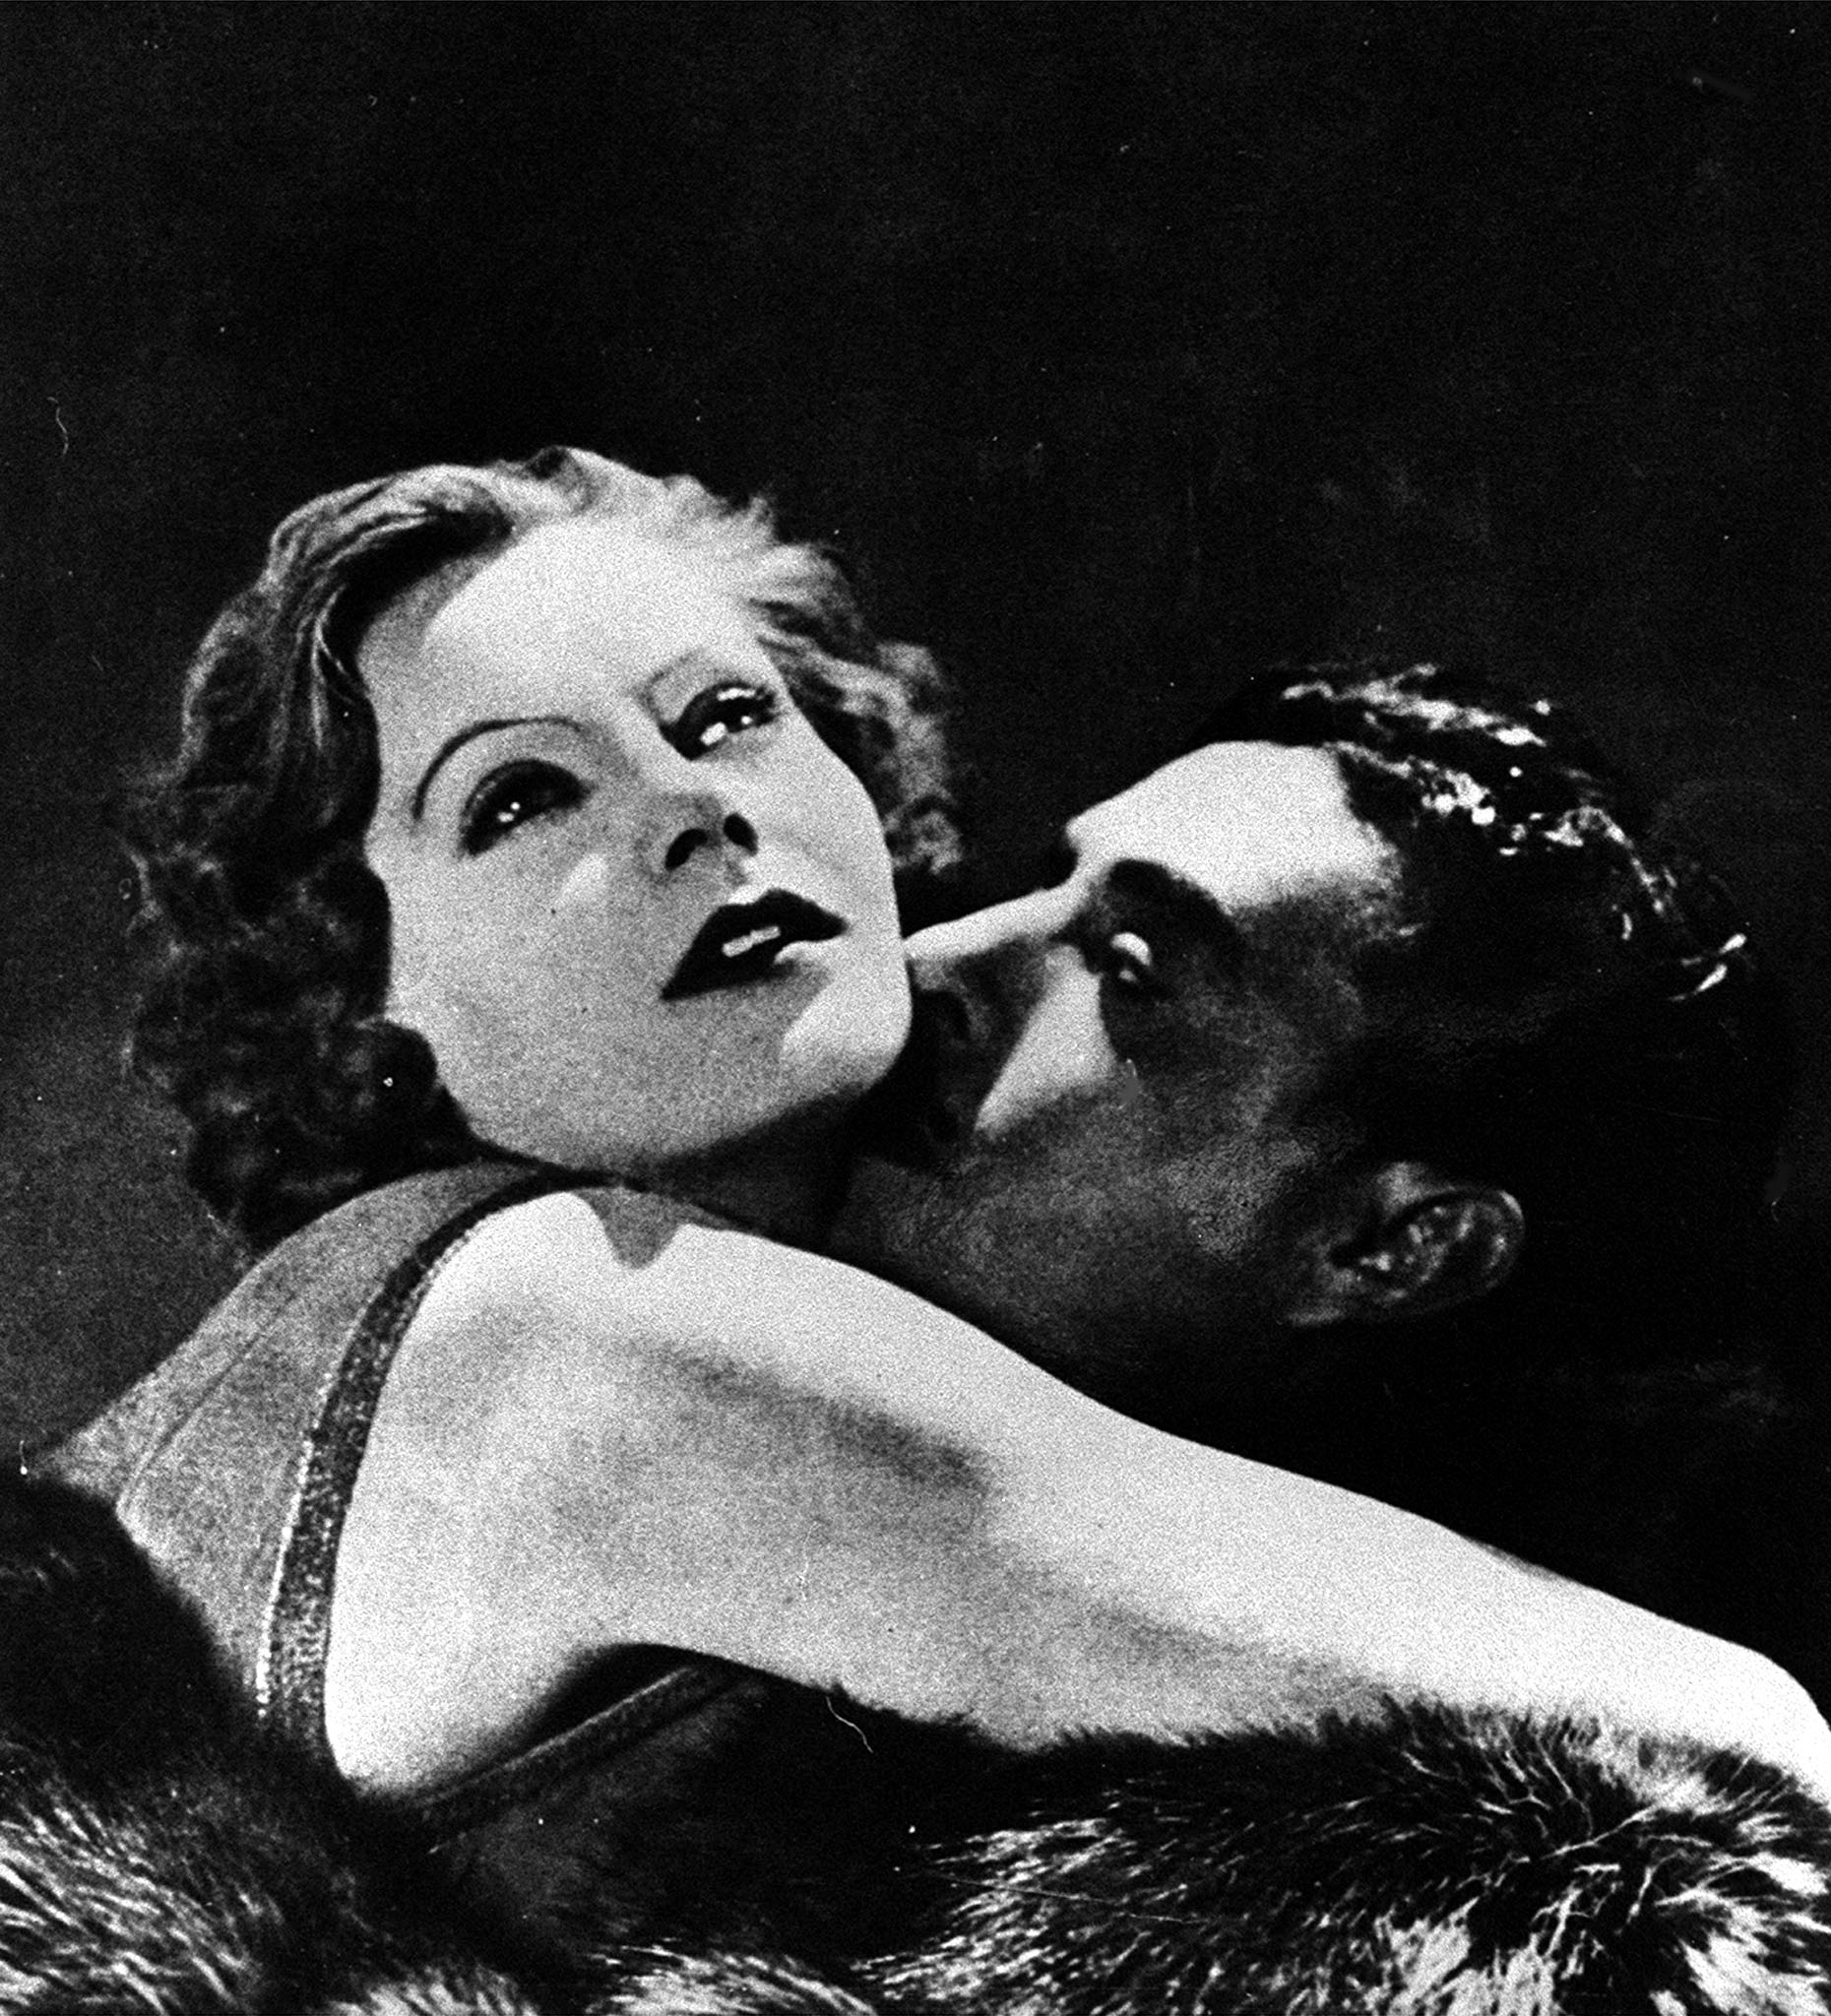 Mostre: Greta Garbo a Milano dal 28 febbraio